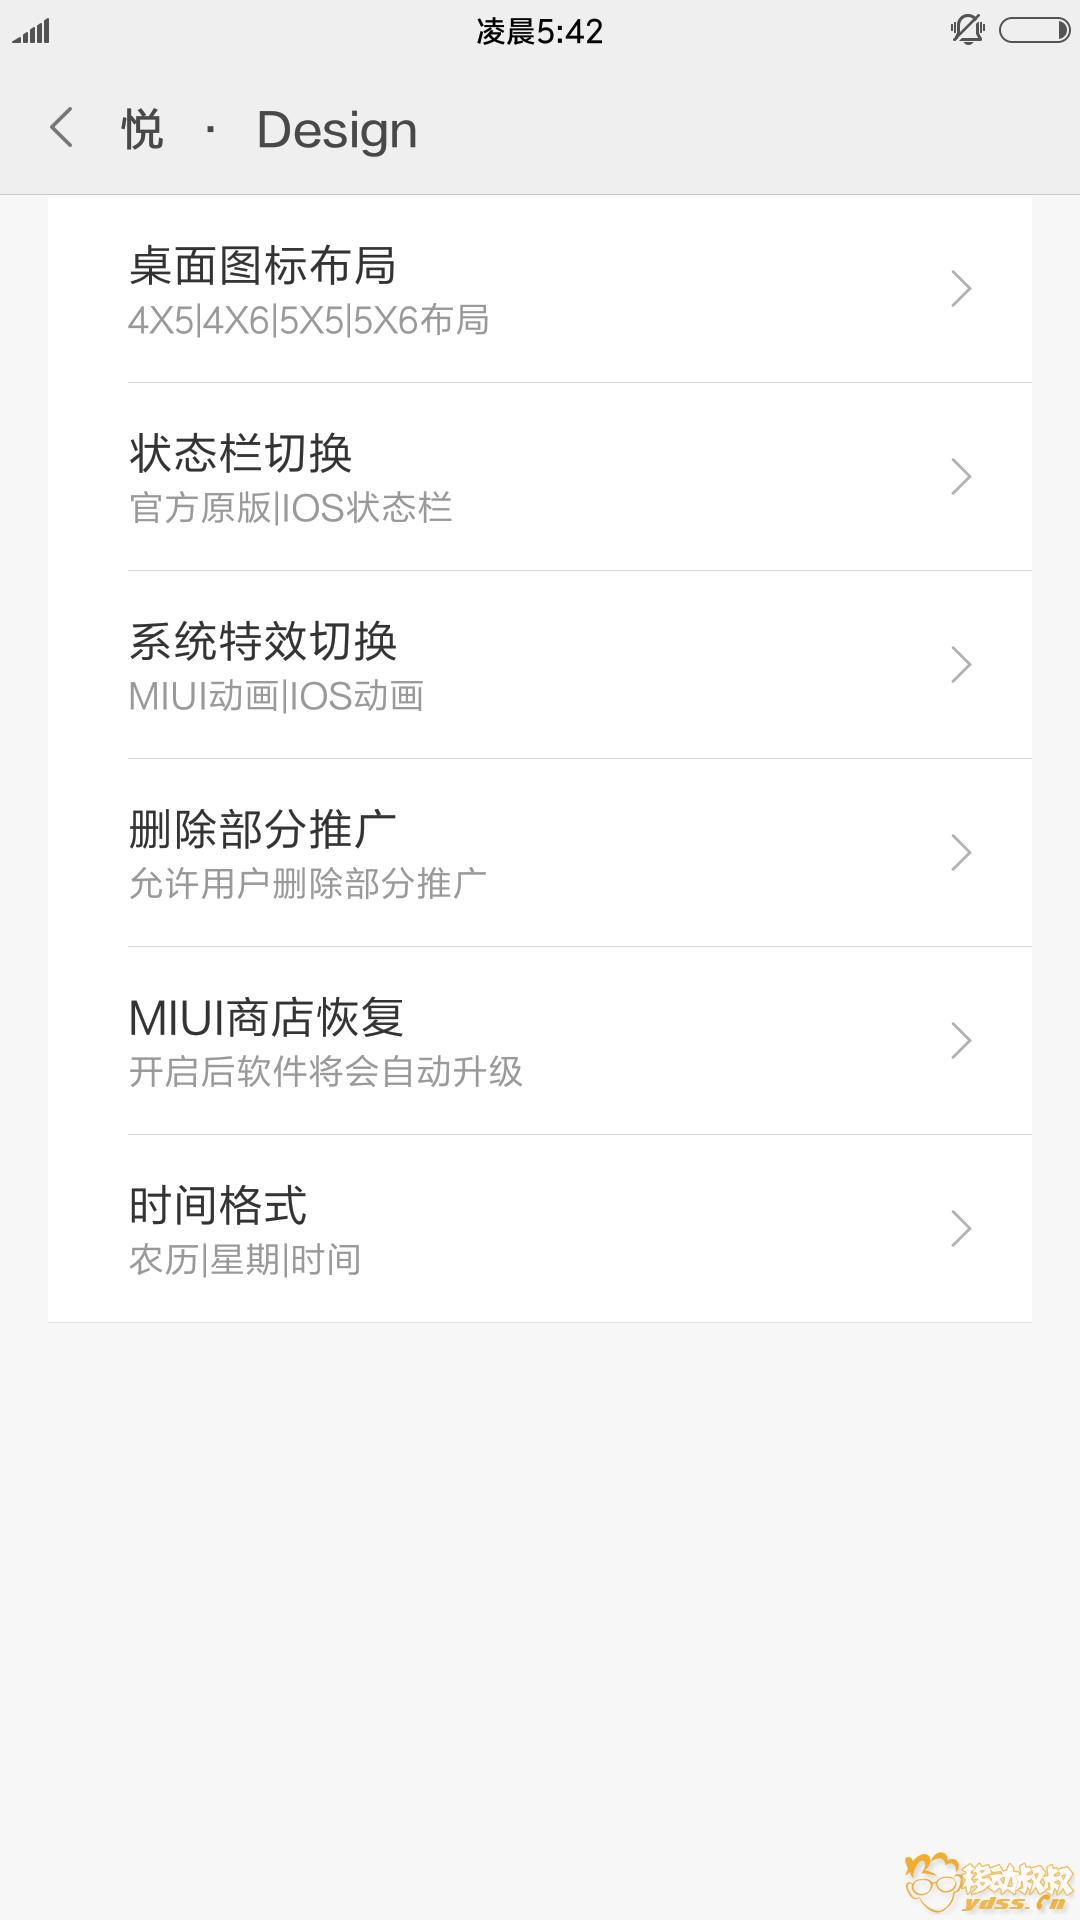 Screenshot_2018-01-09-05-42-57-336_com.mrxy.design.png